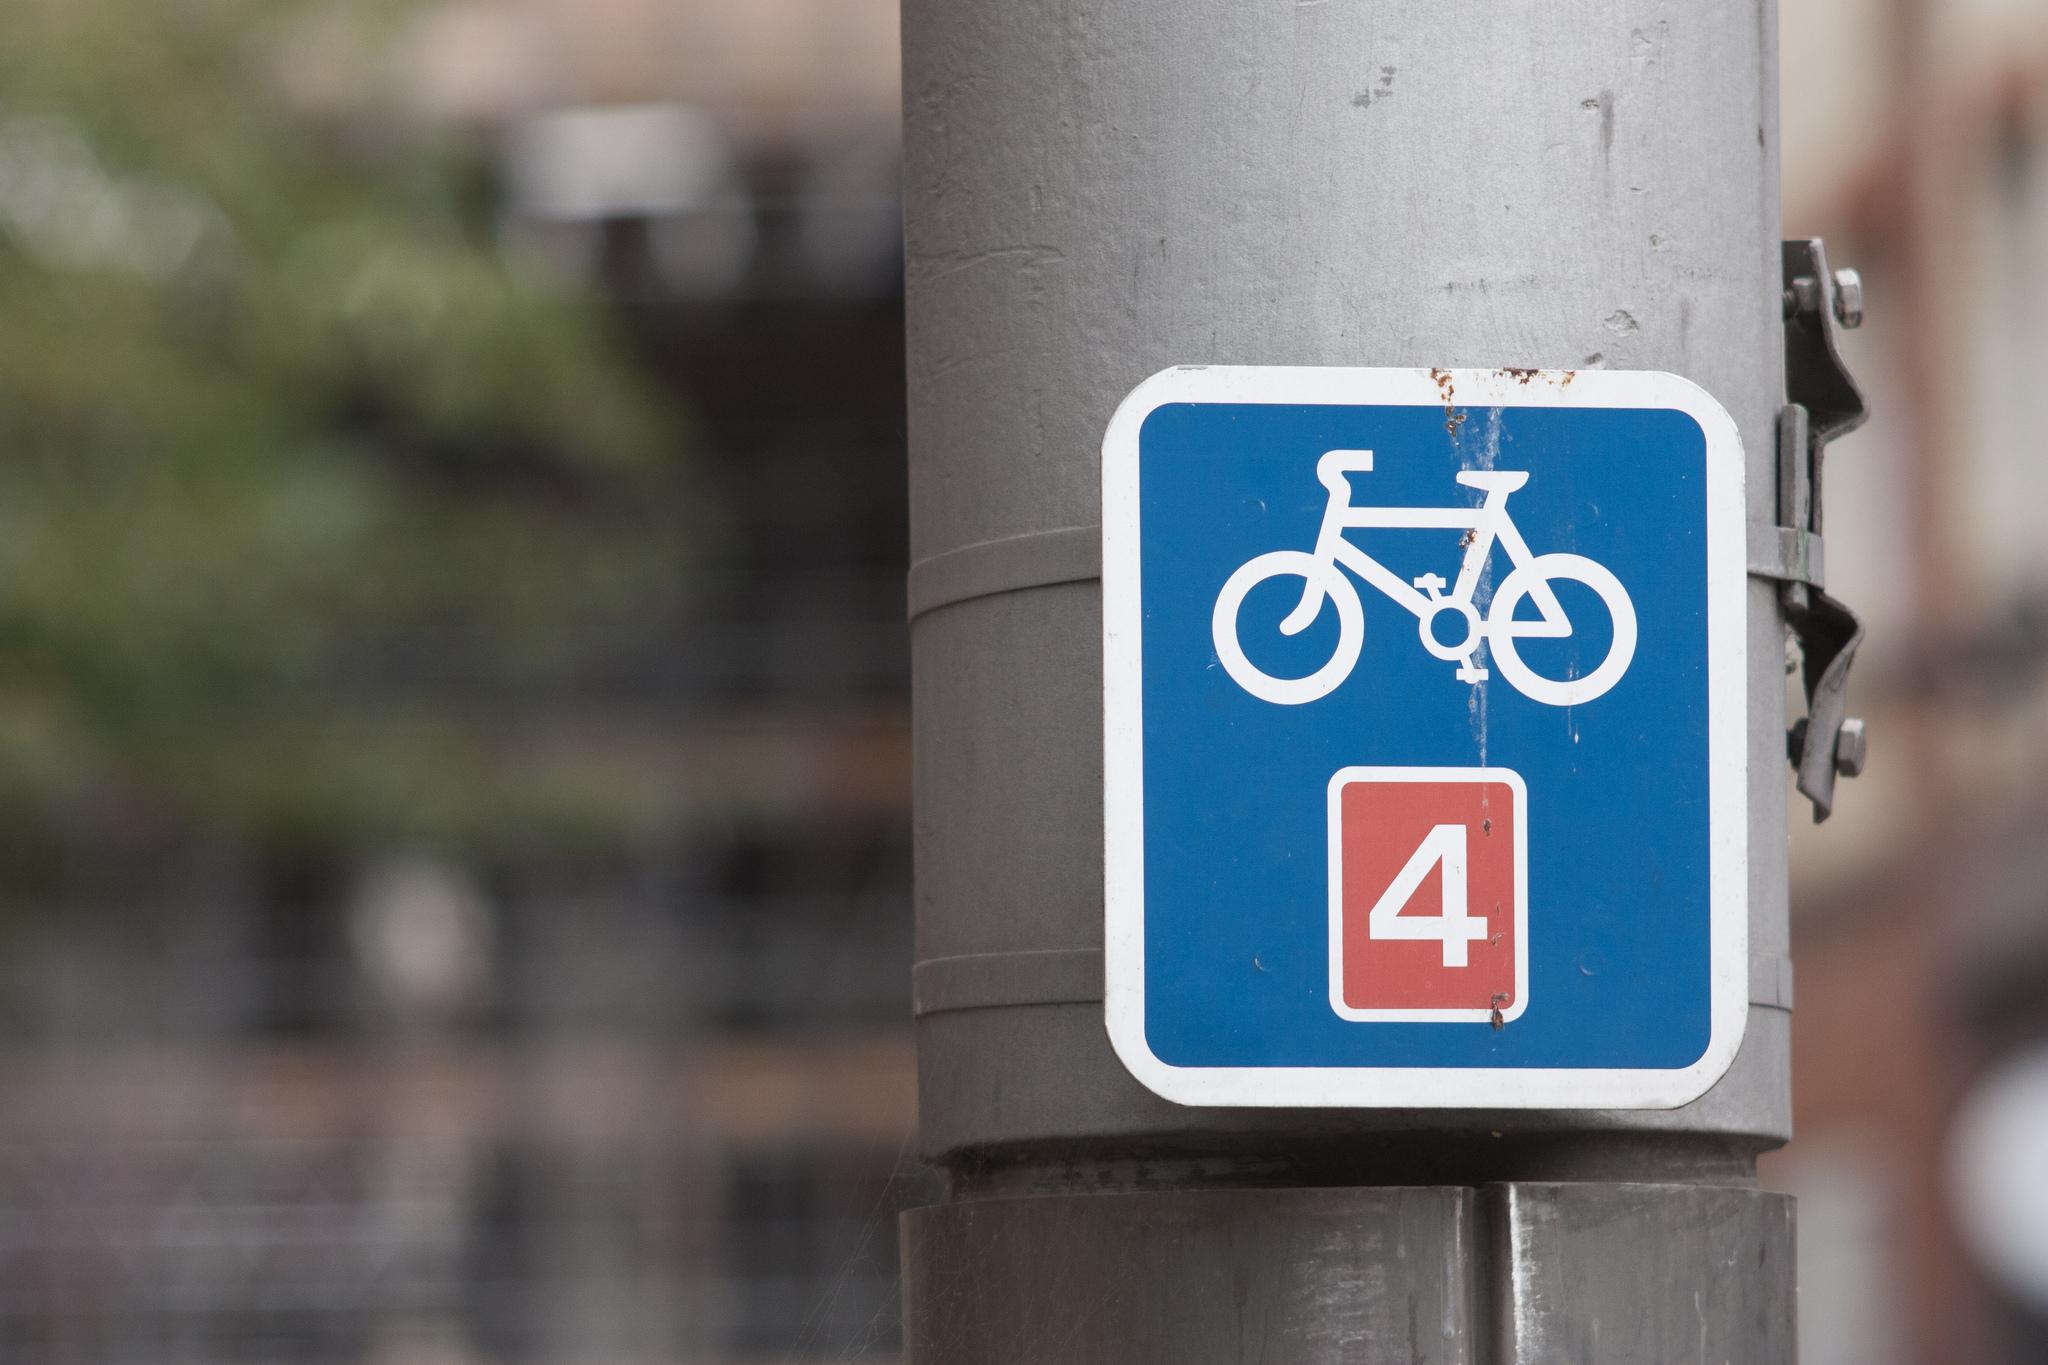 Cycling lane, cycle path, commuting, sign, London (Pic: Dimitri Hon via Flickr Creative Commons)